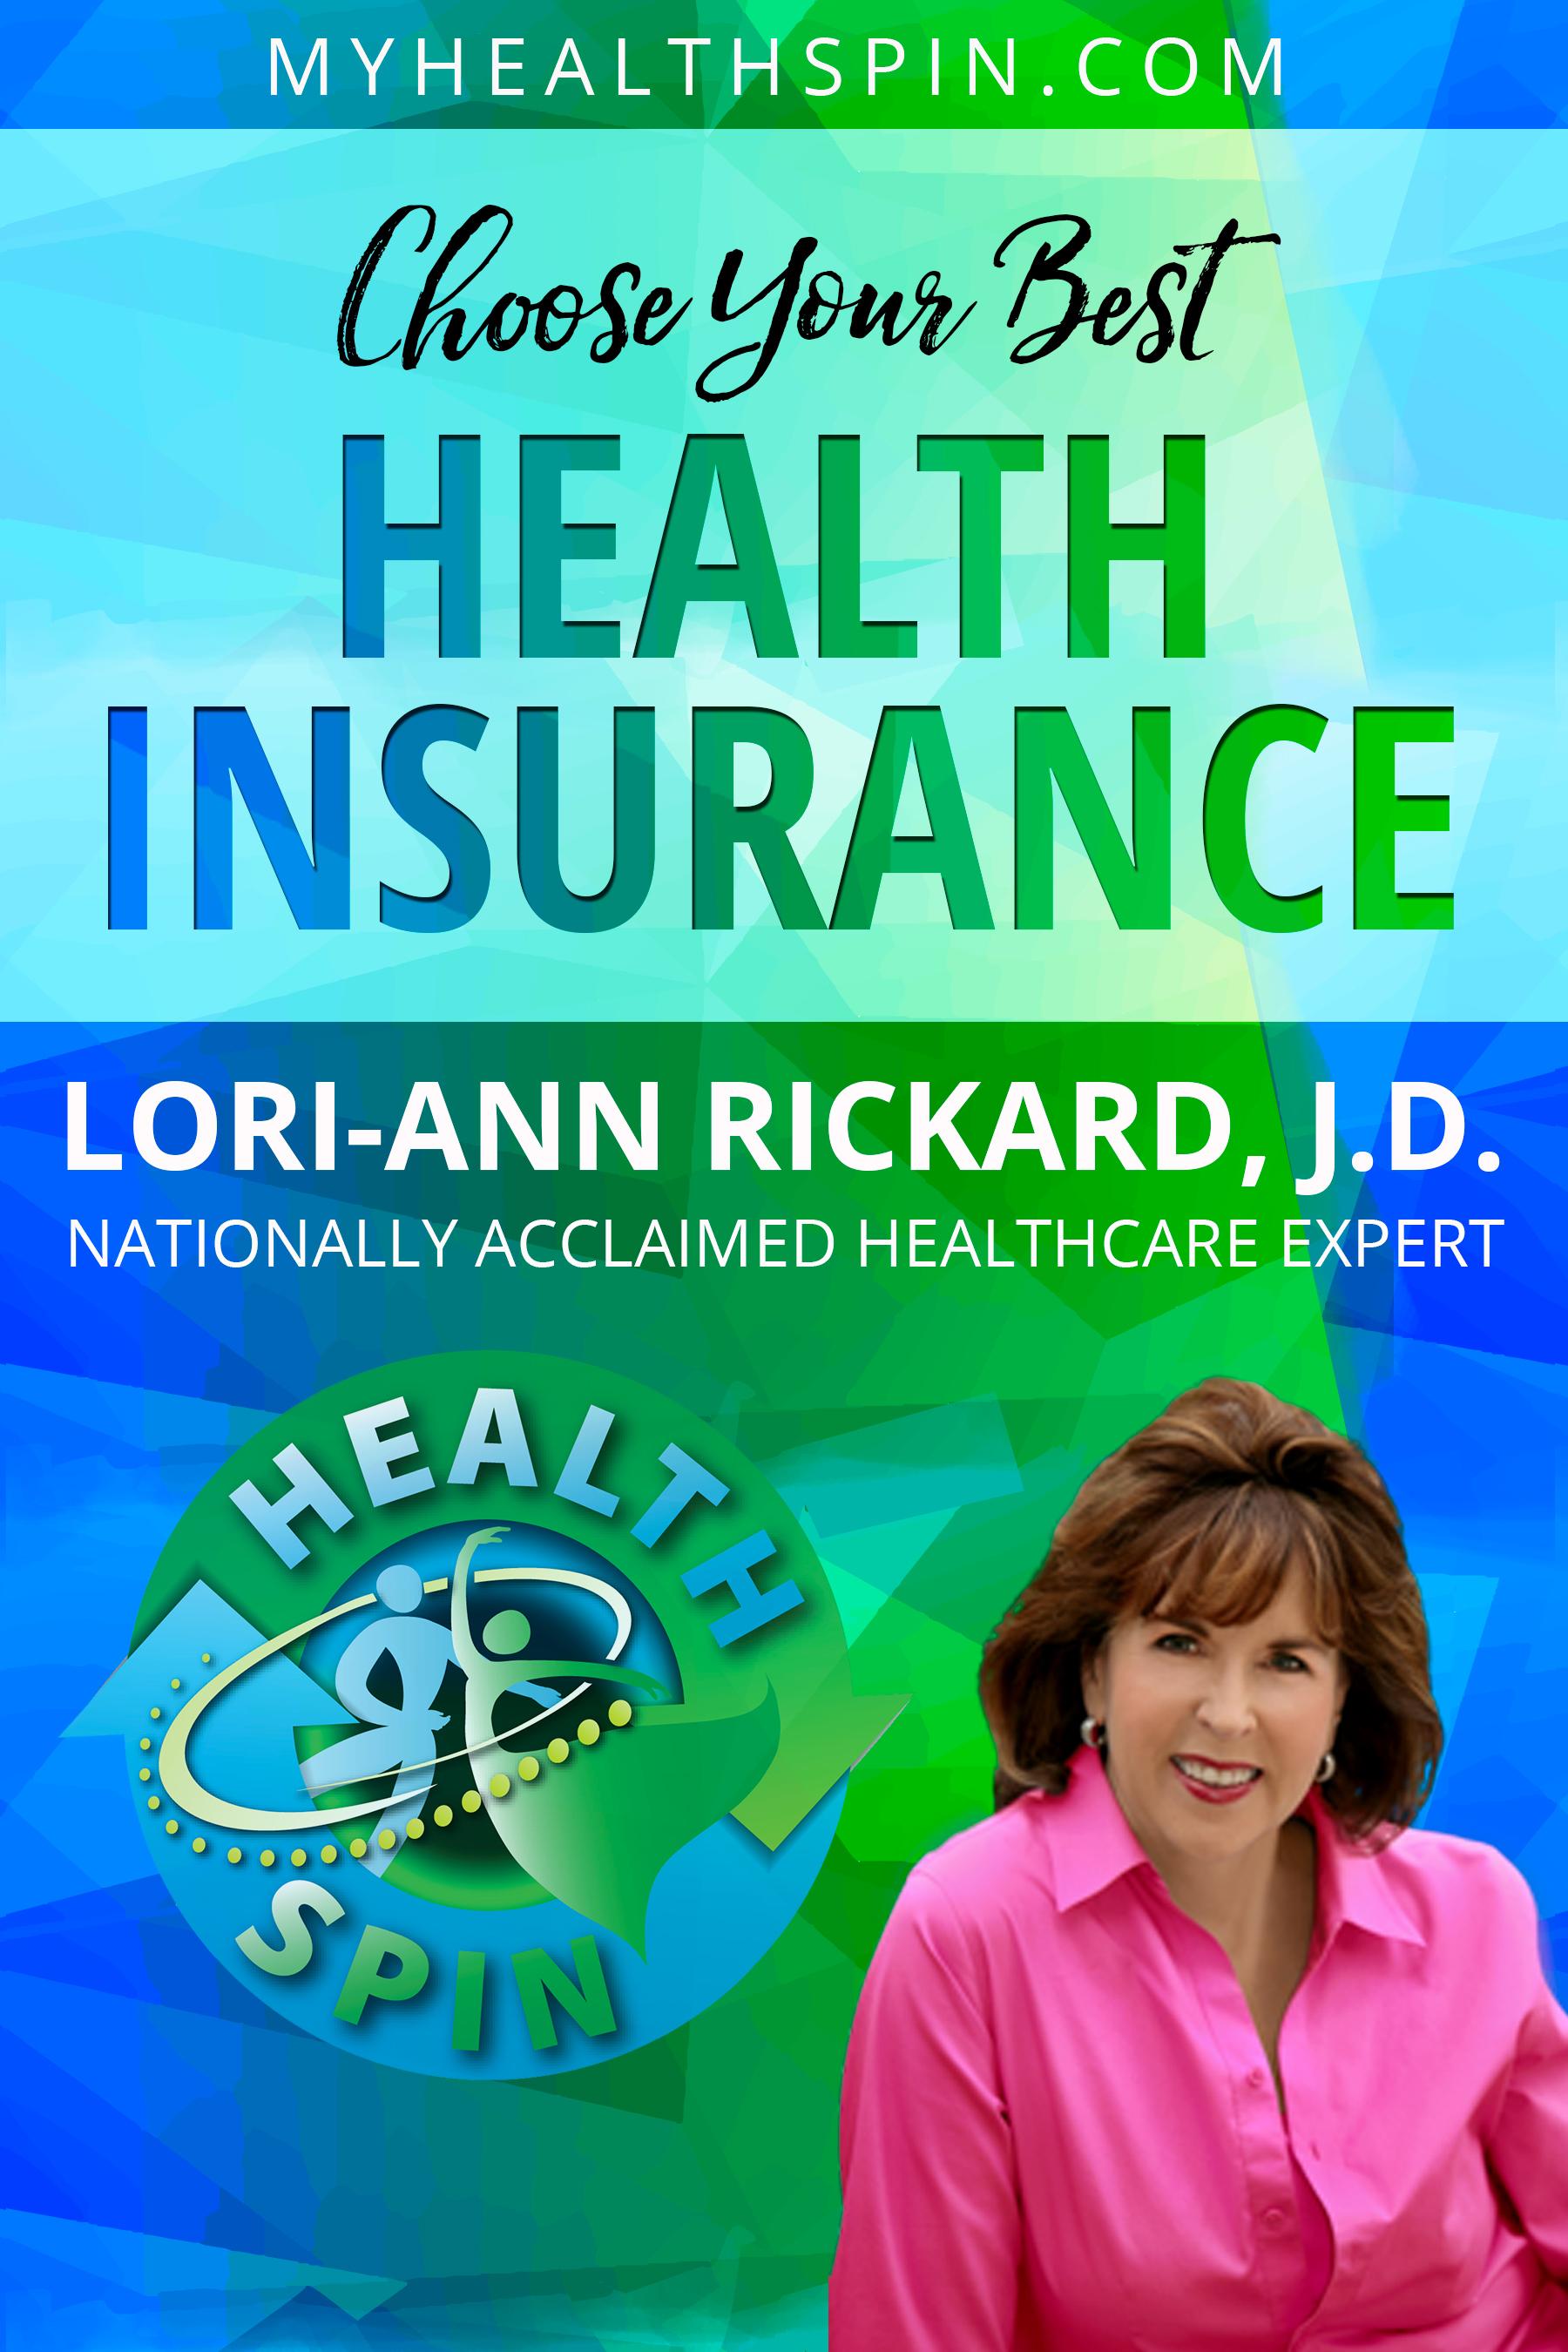 Easy Health Care: Choose Your Health Insurance by Lori-Ann Rickard